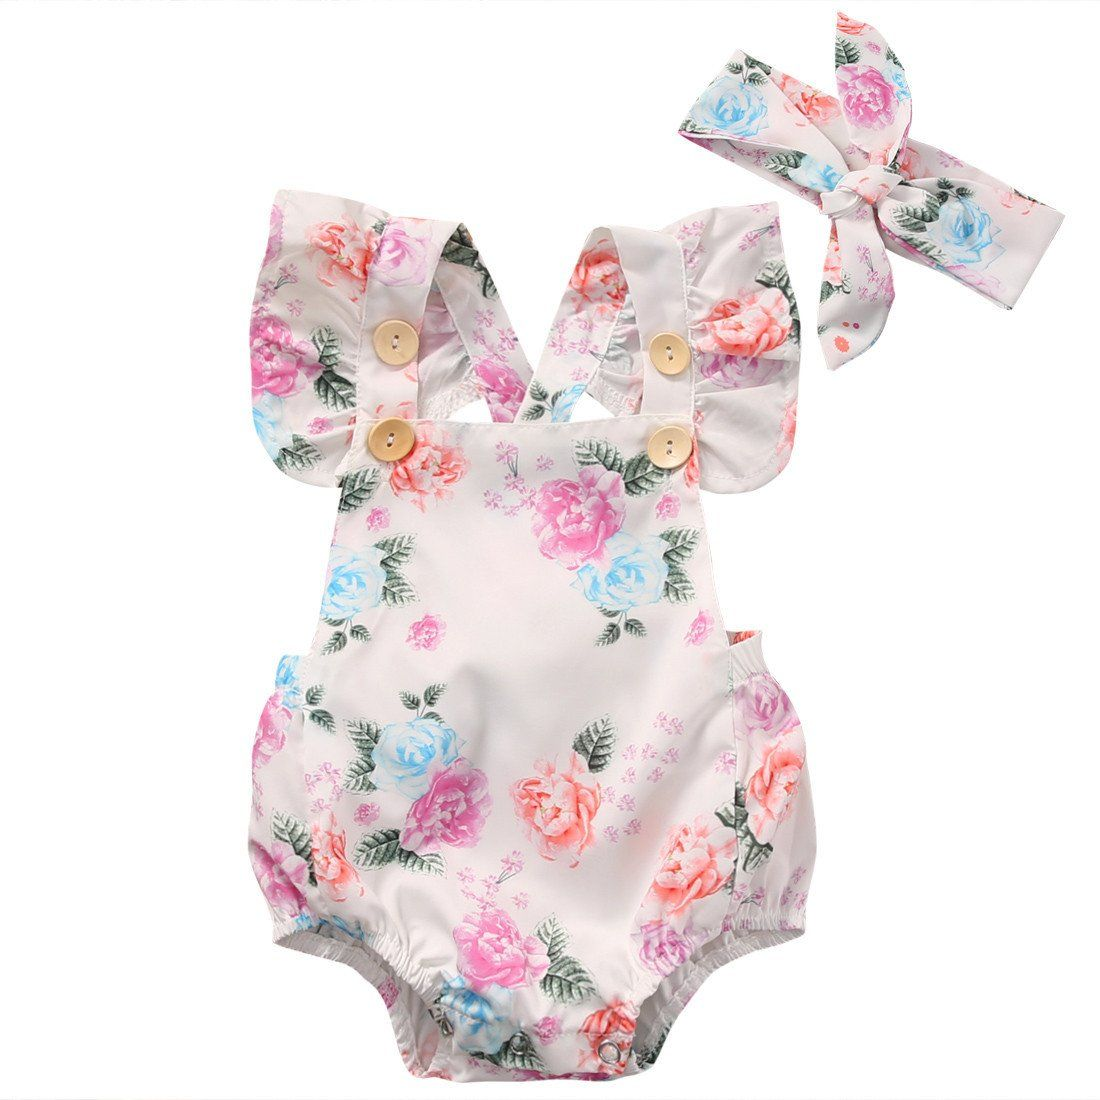 Newborn Baby Toddler Girl Romper Jumpsuit Bodysuit Headband Set Sunsuit Outfits